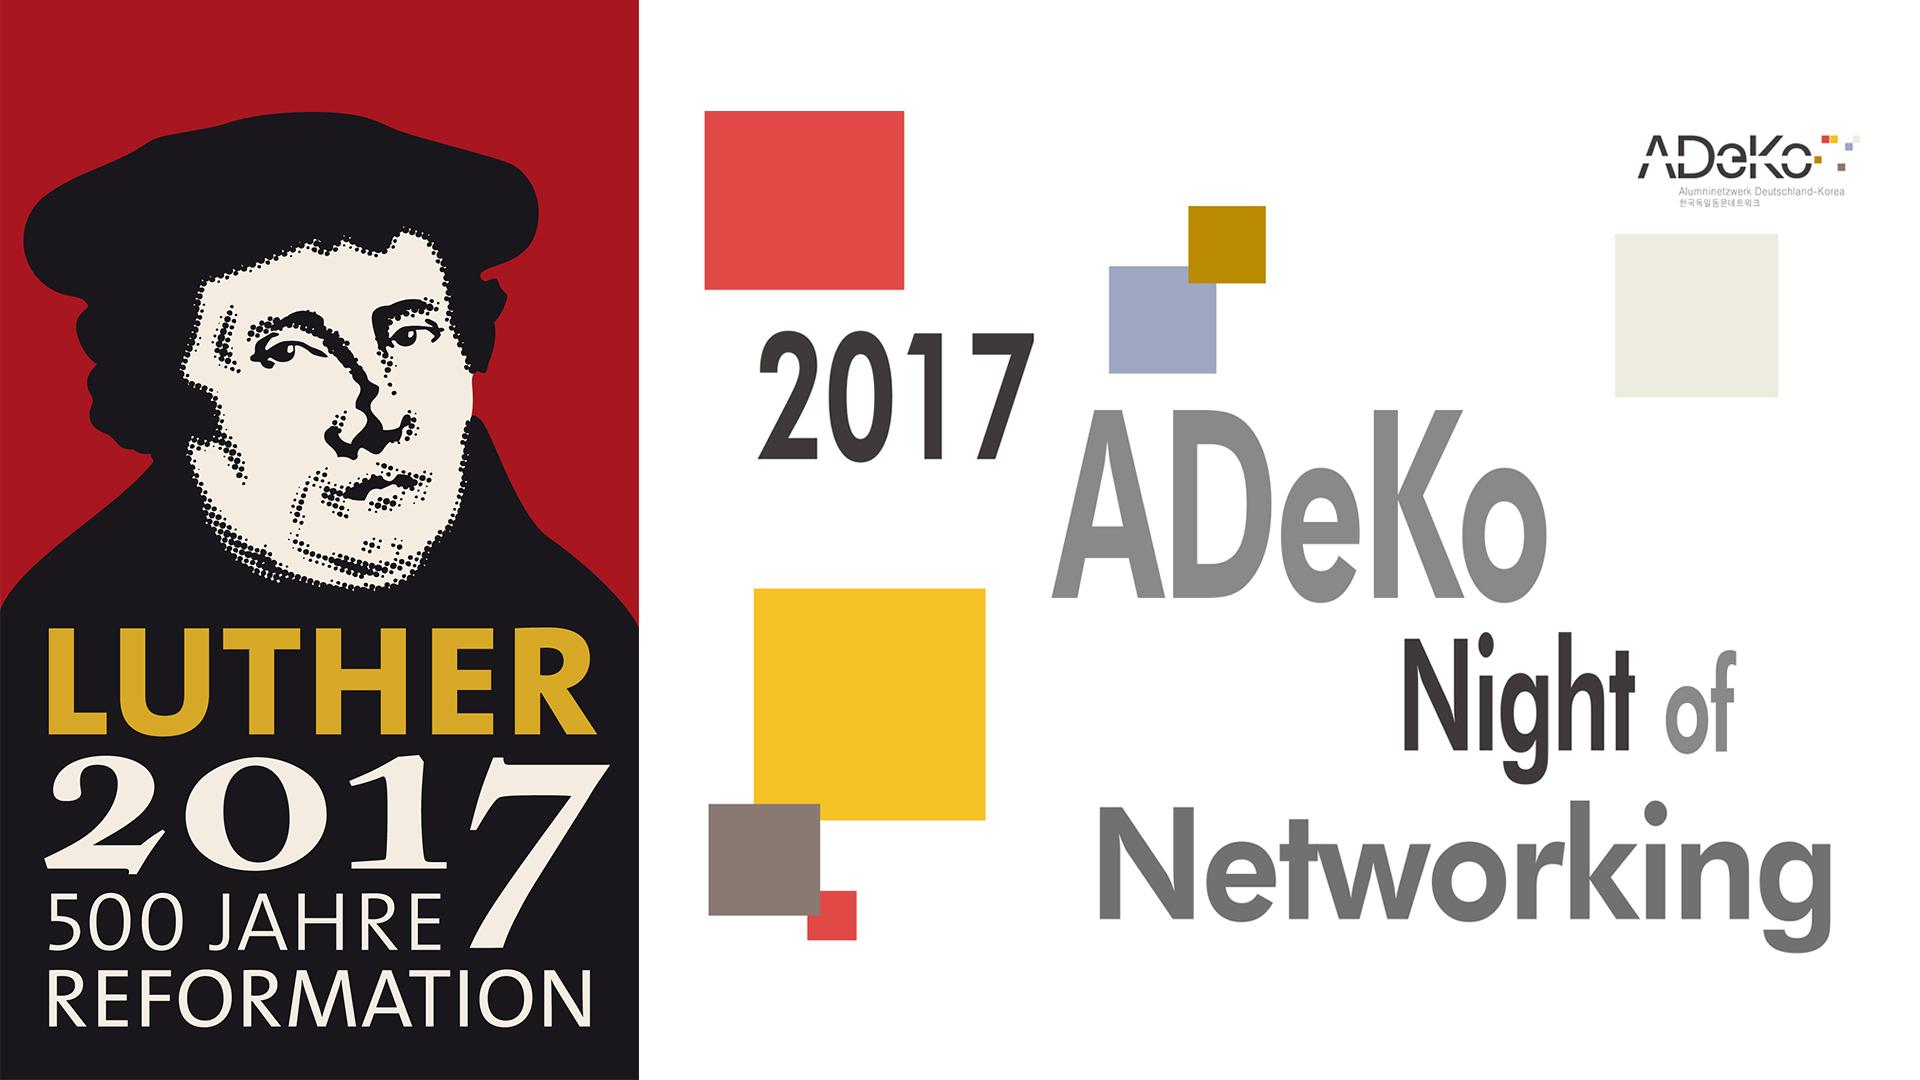 2017 Adeko Daniel interview